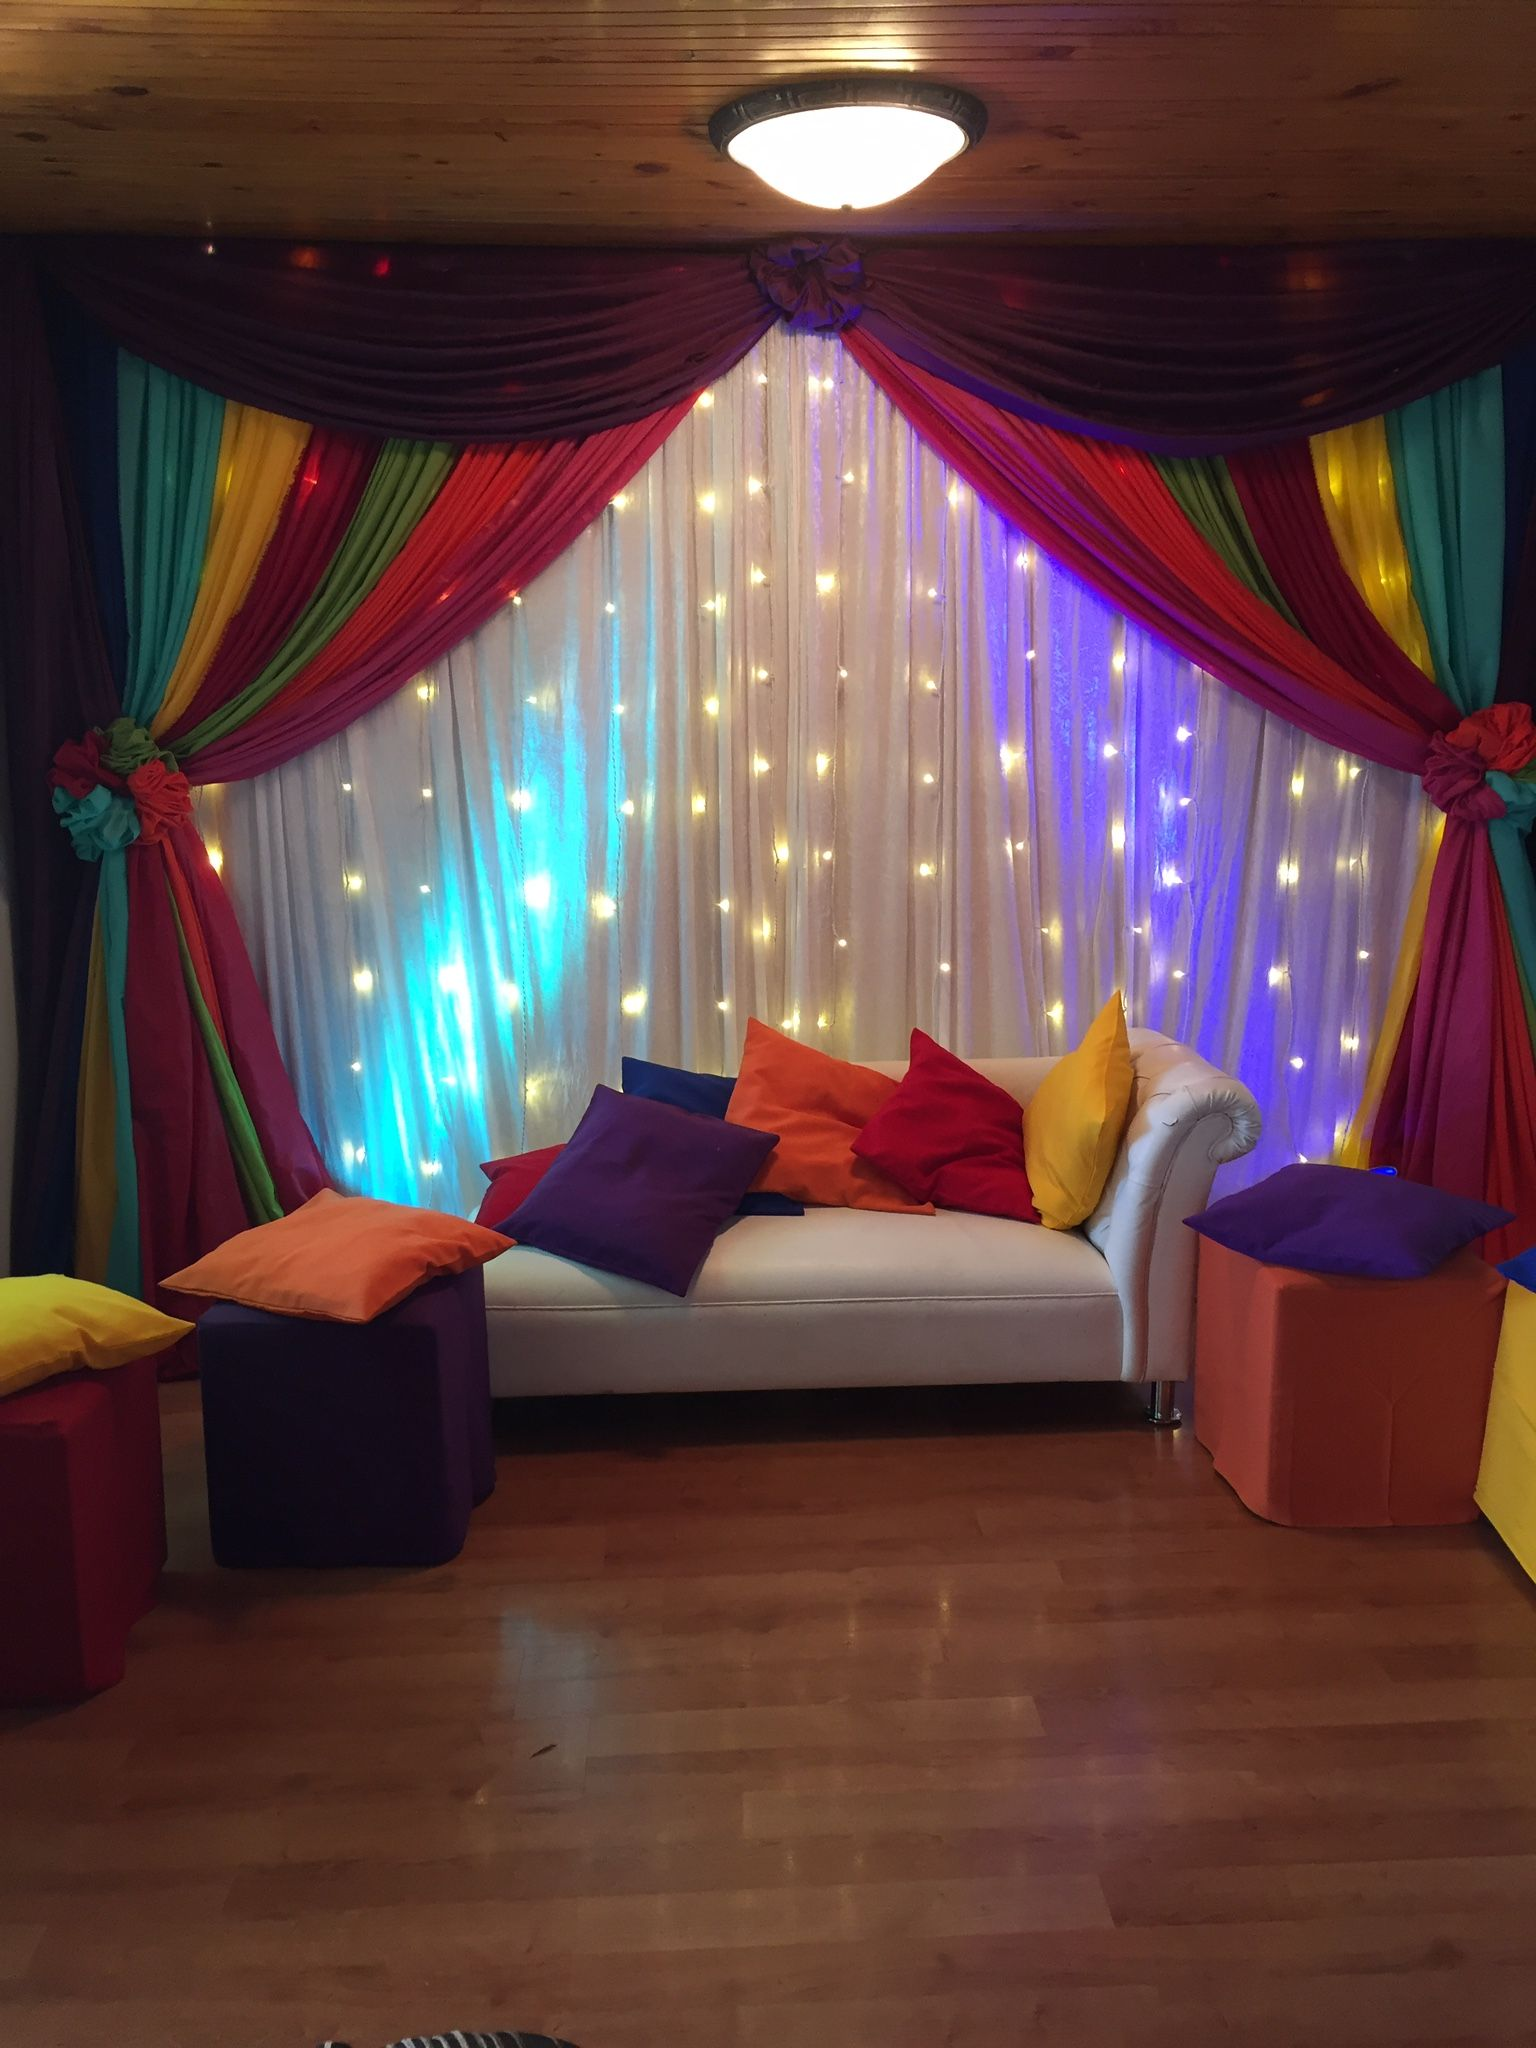 Night wedding decor ideas  Colourful indoor Mehndi decor u  mehndi night  Pinteu